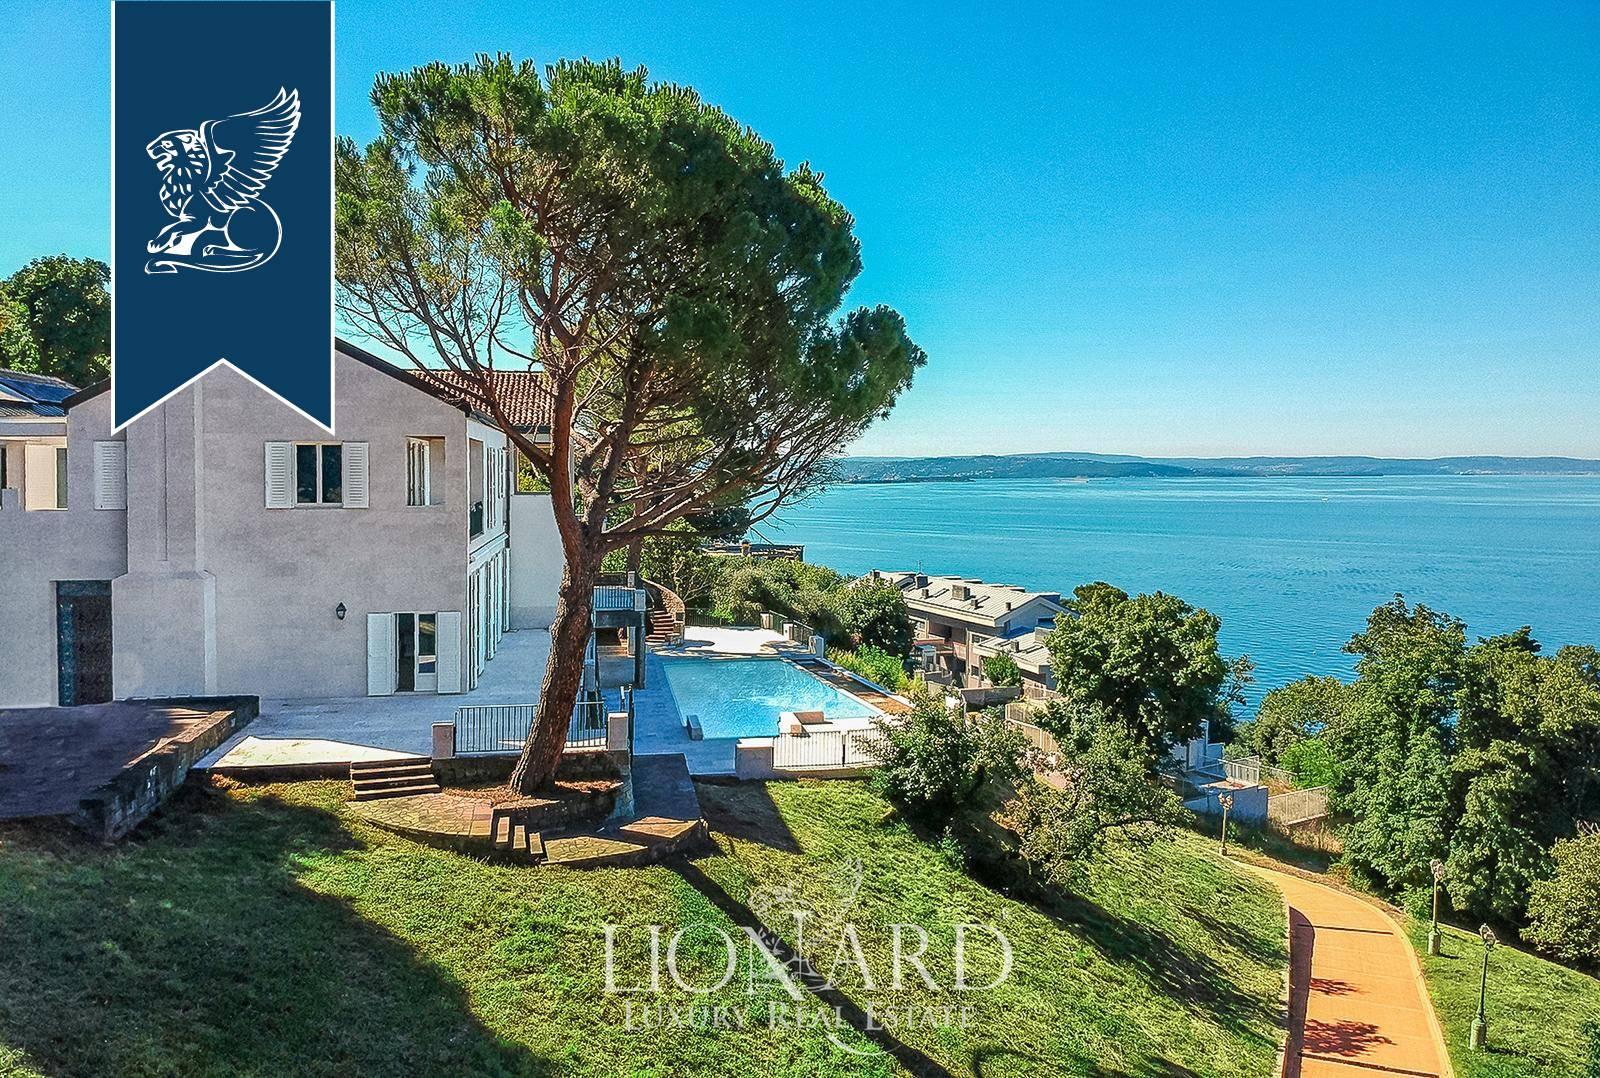 Villa in Vendita a Trieste: 0 locali, 900 mq - Foto 5